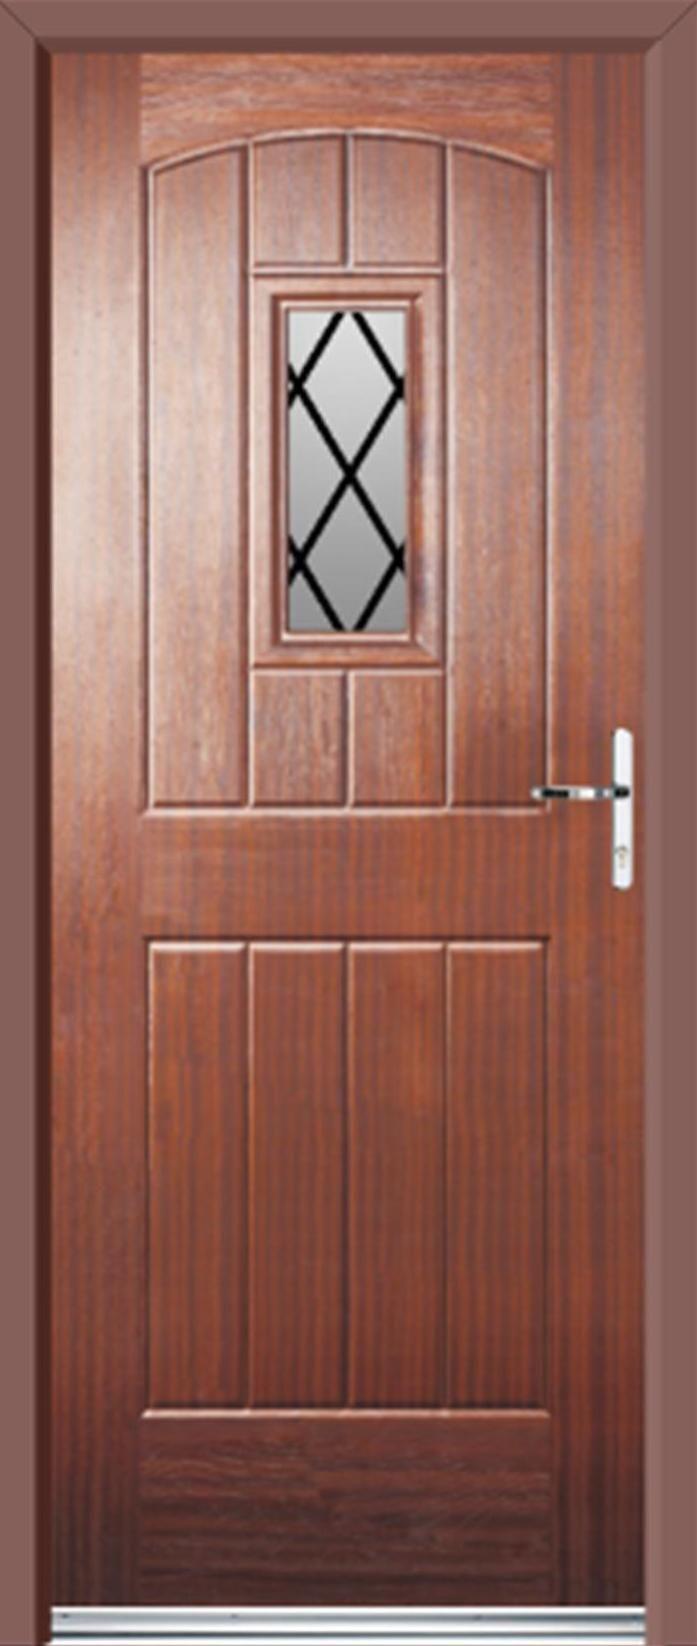 Cottage Style Exterior Doors Upvc Doors English Cottage Diamond